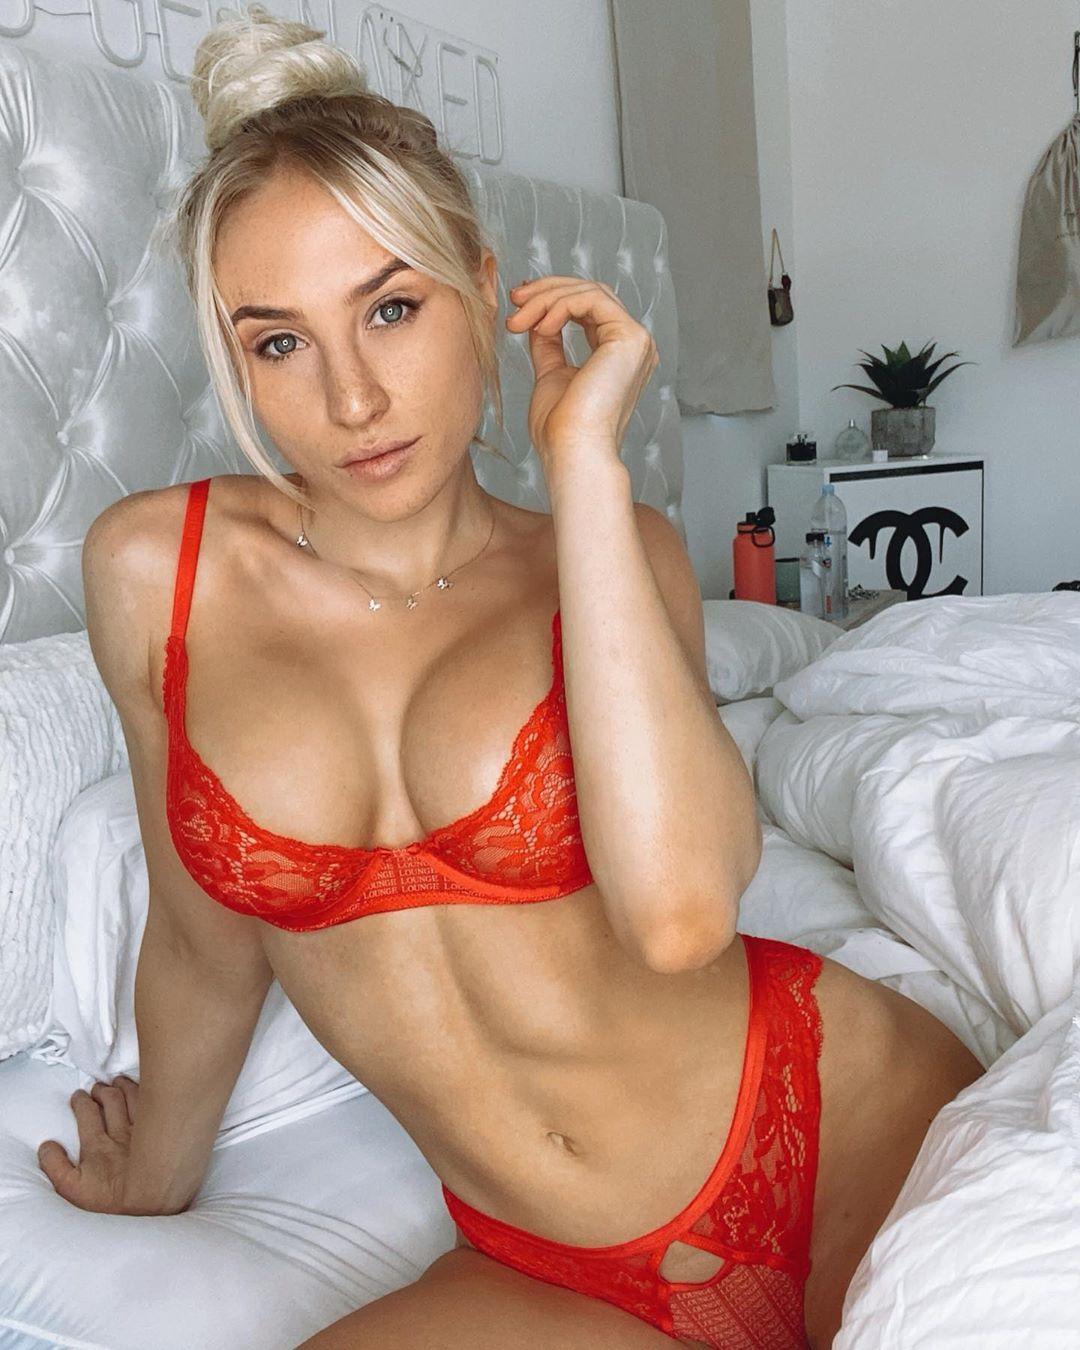 Lauren Dascalo Nude & Sex Tape Onlyfans Leaked 0035